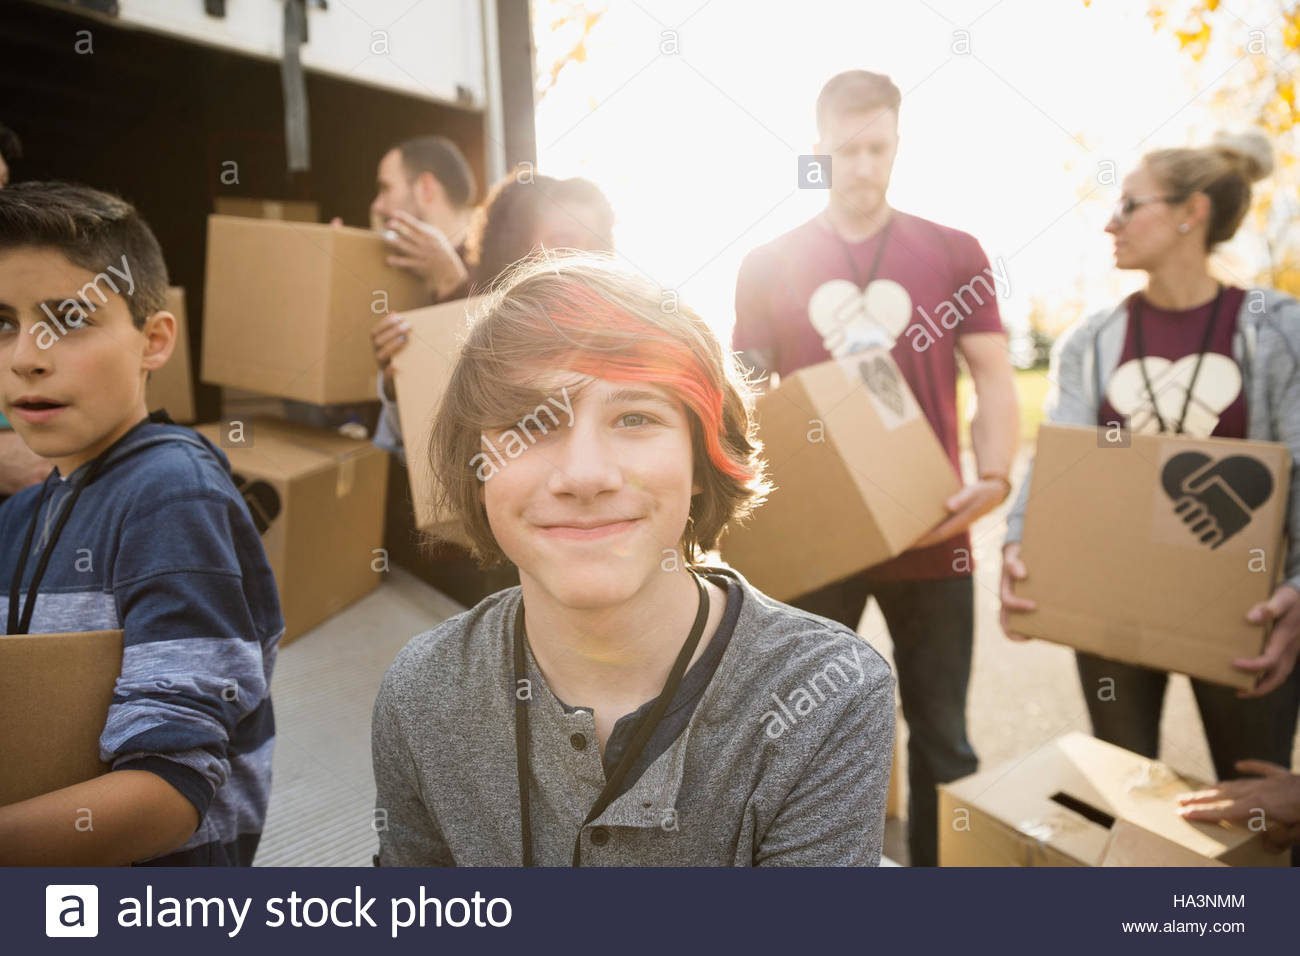 Boy Helping Charity Stockfotos & Boy Helping Charity Bilder - Alamy